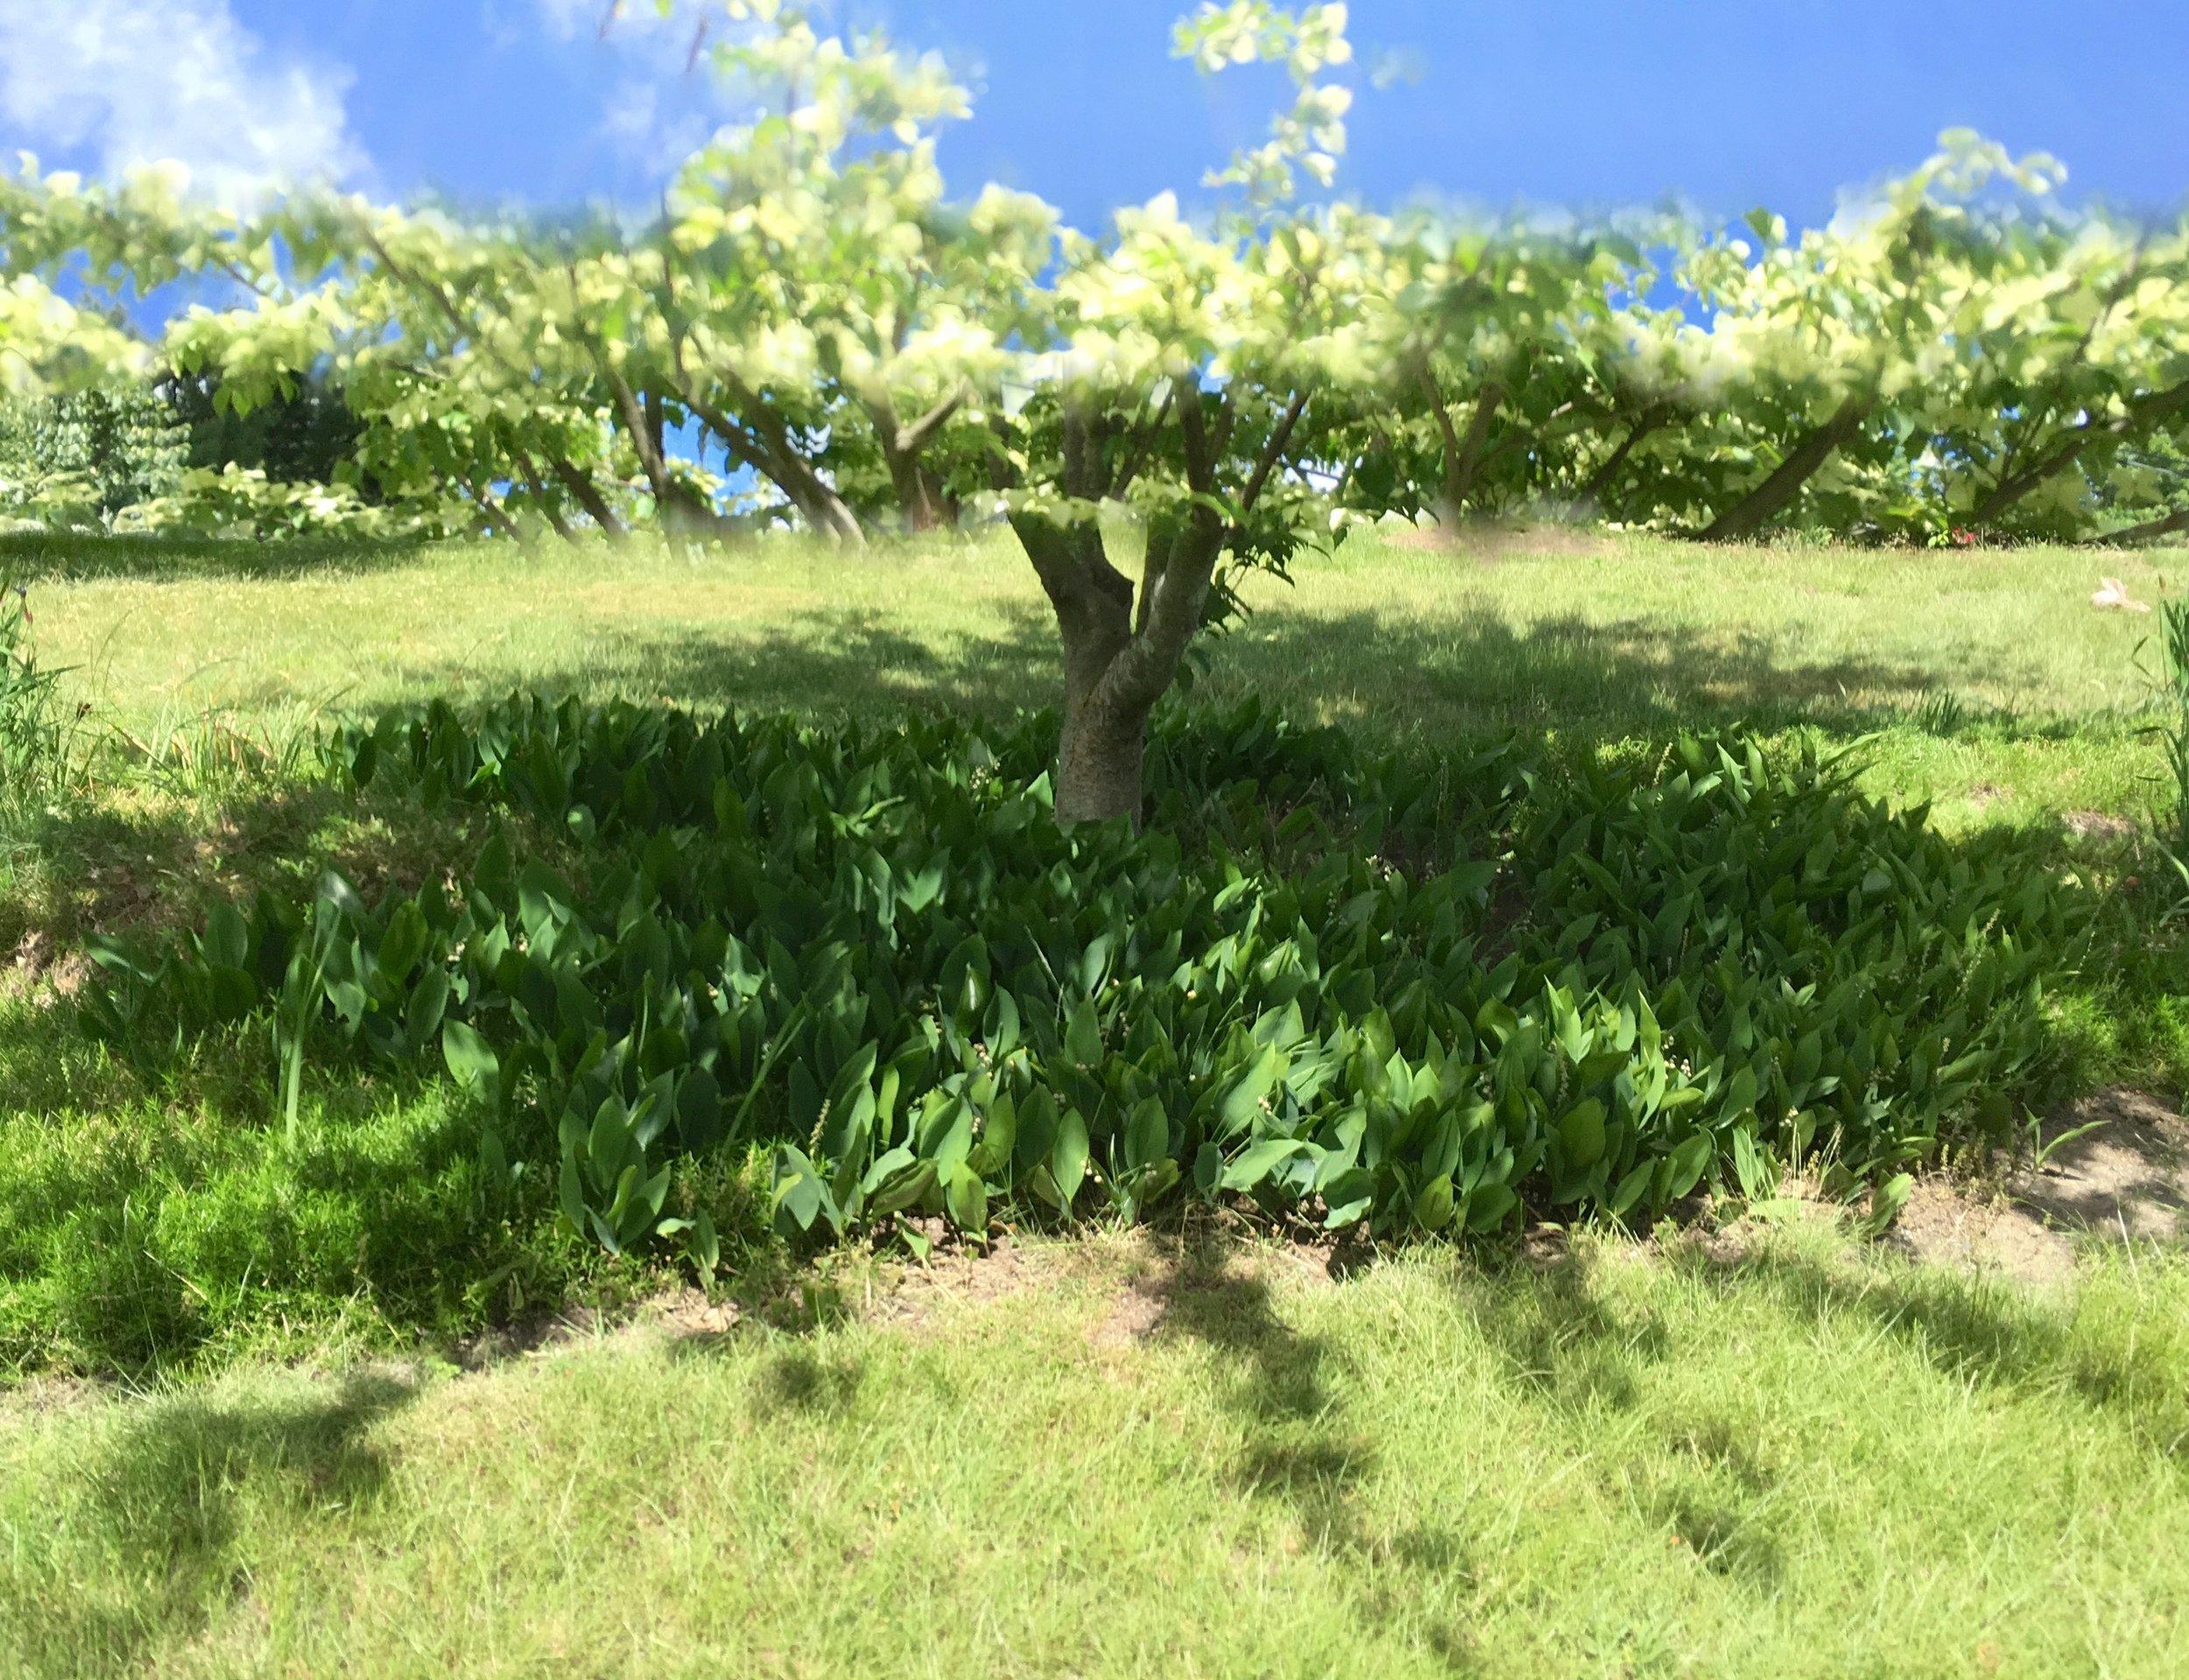 pano tree v2 #38 IMG_7510 copy.jpg